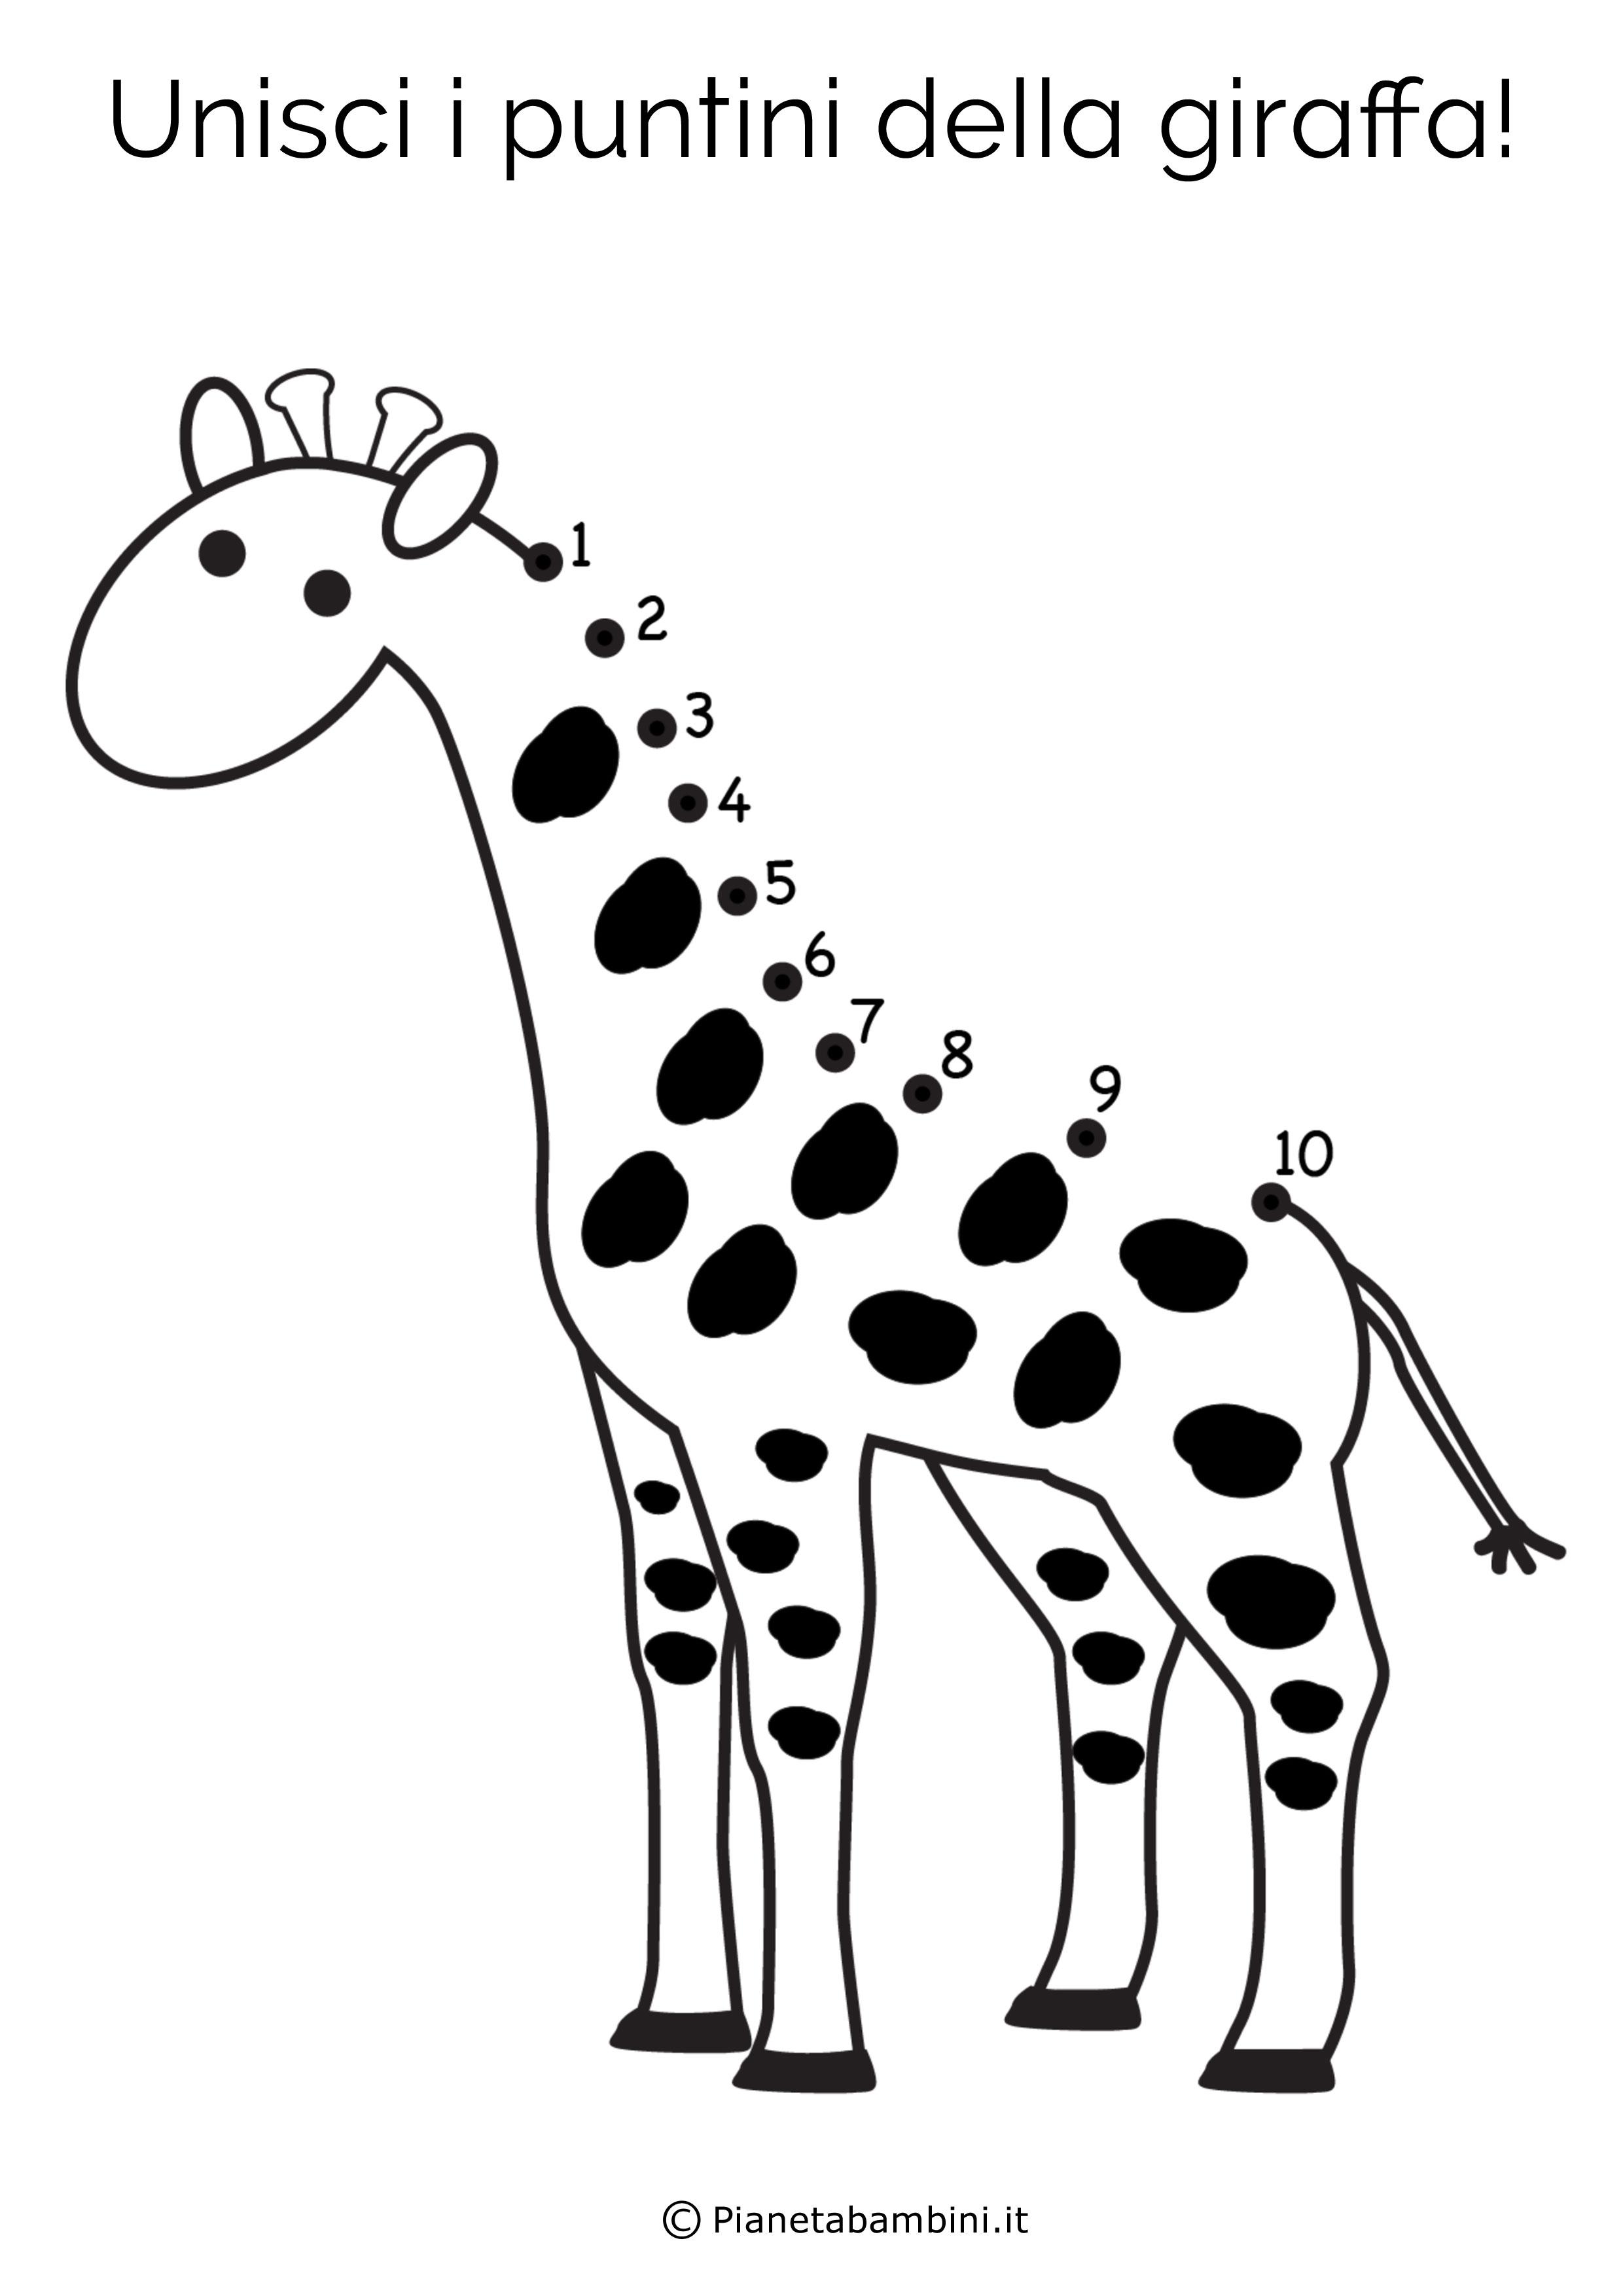 Disegno unisci i puntini giraffa